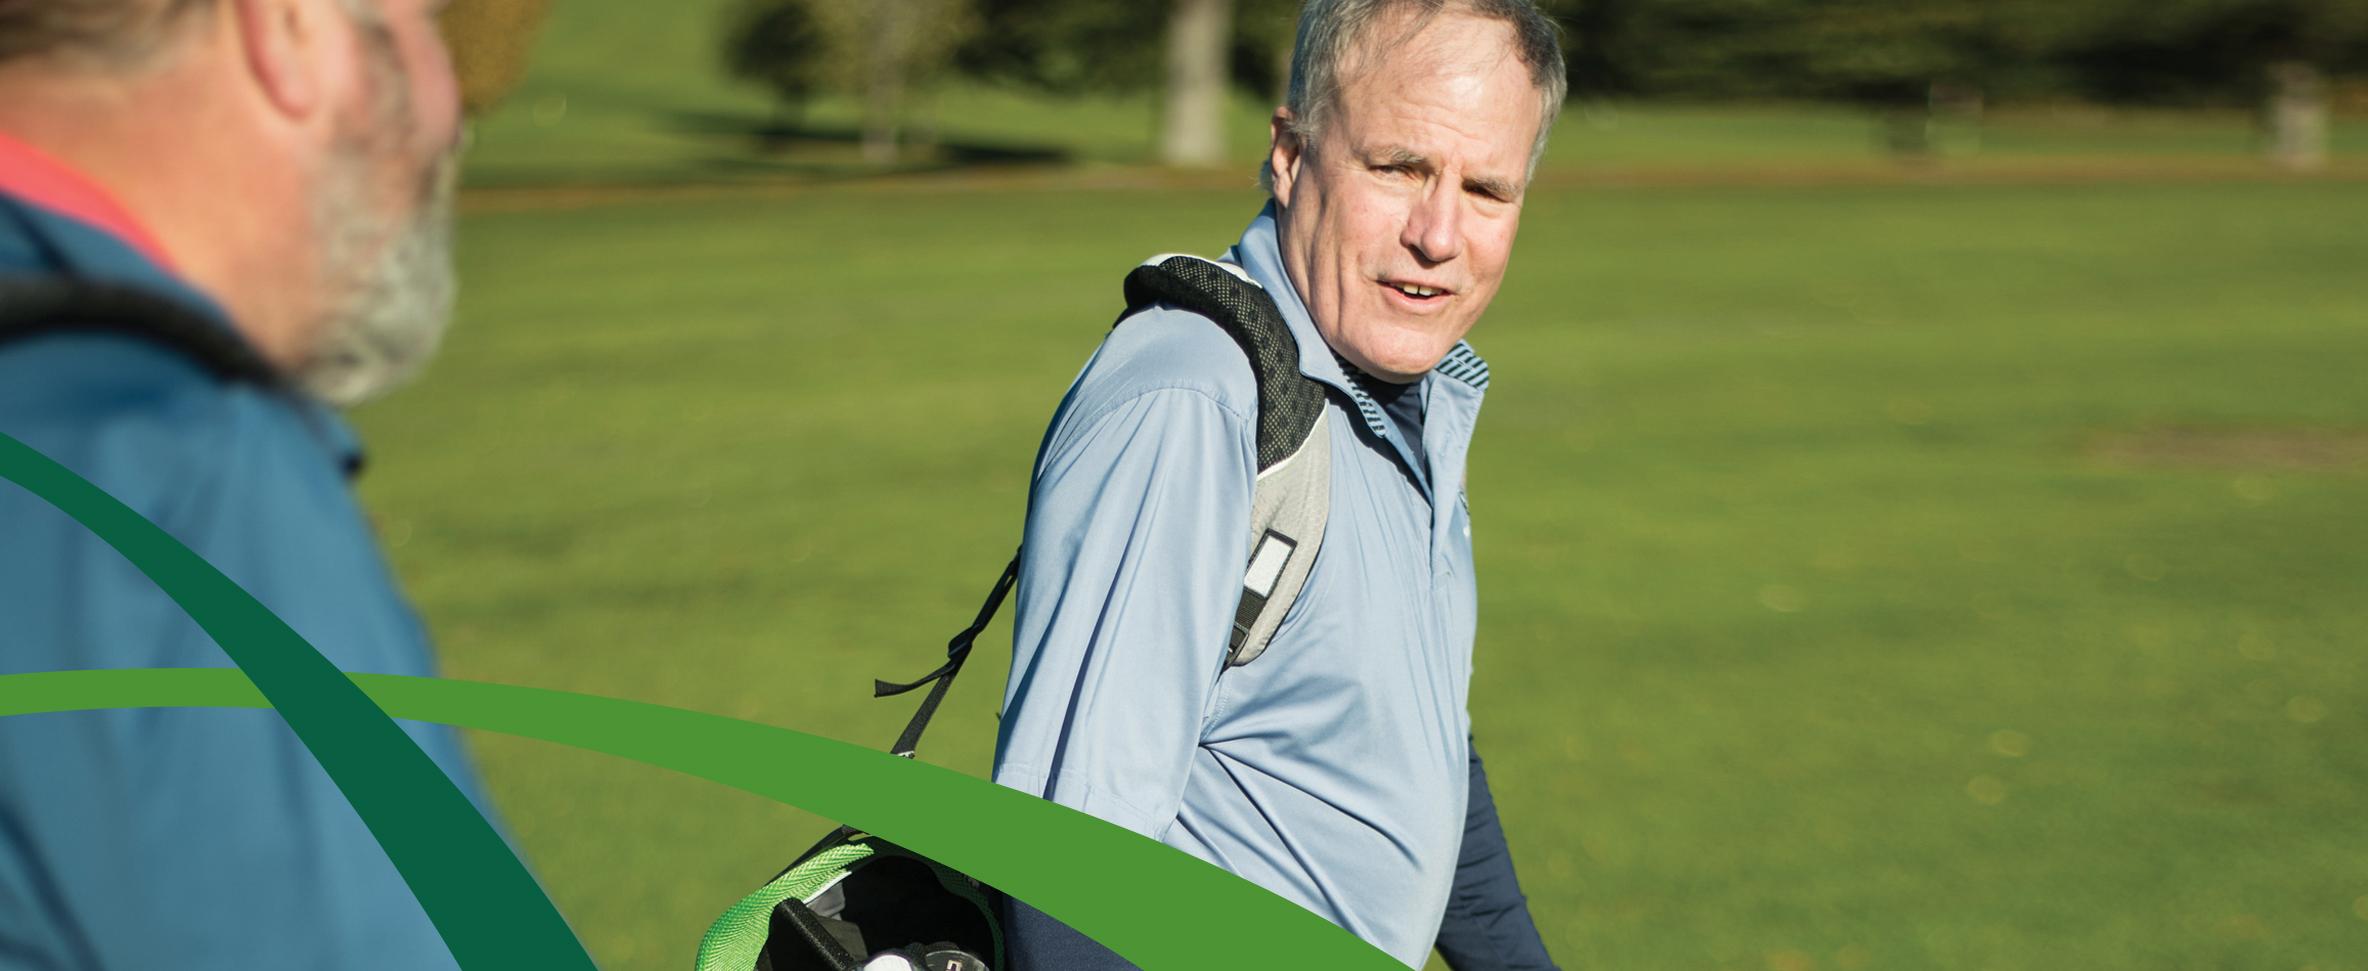 Christopher M. Meriam, MD, CVMC Orthopedic Surgeon, playing golf